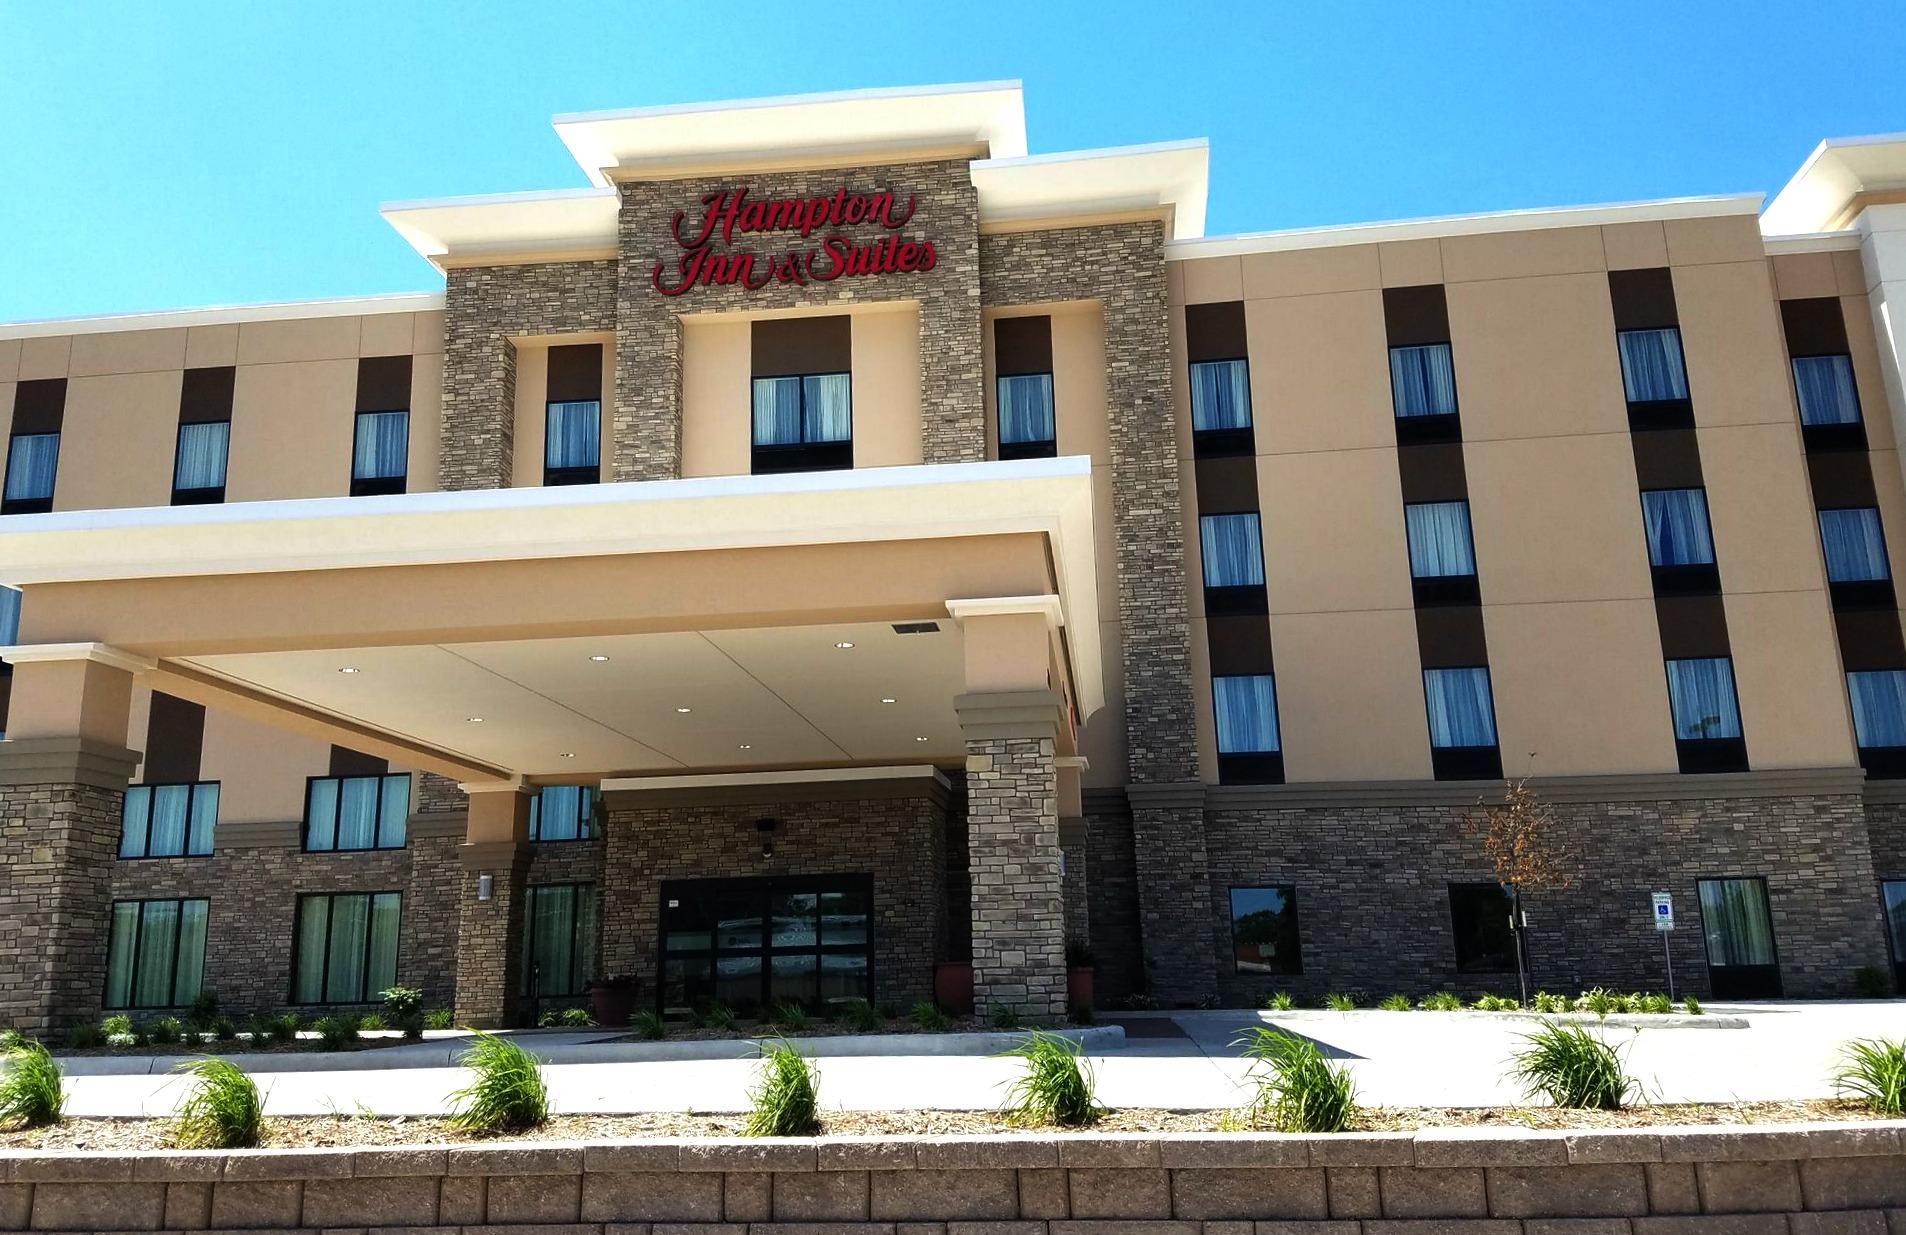 Hampton Inn & Suites Brightens Mason City, Iowa